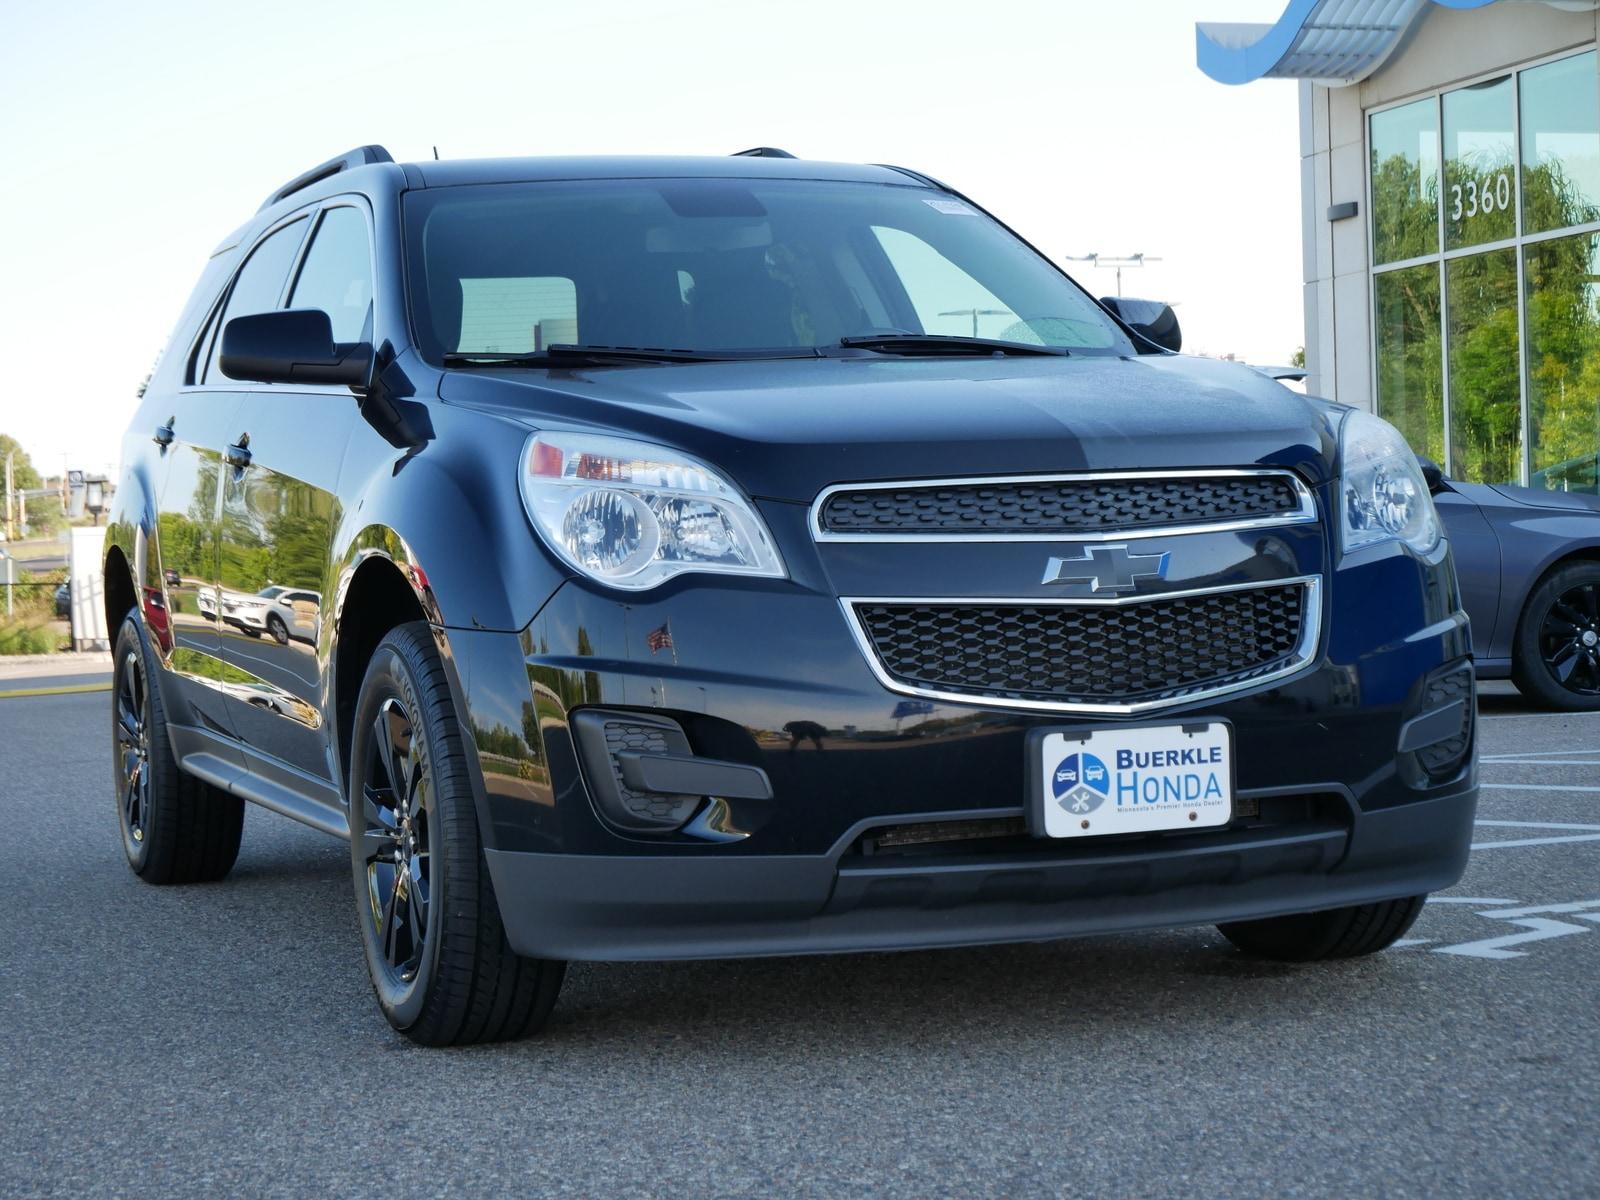 Used 2015 Chevrolet Equinox 1LT with VIN 2GNFLFEK7F6177361 for sale in Saint Paul, Minnesota